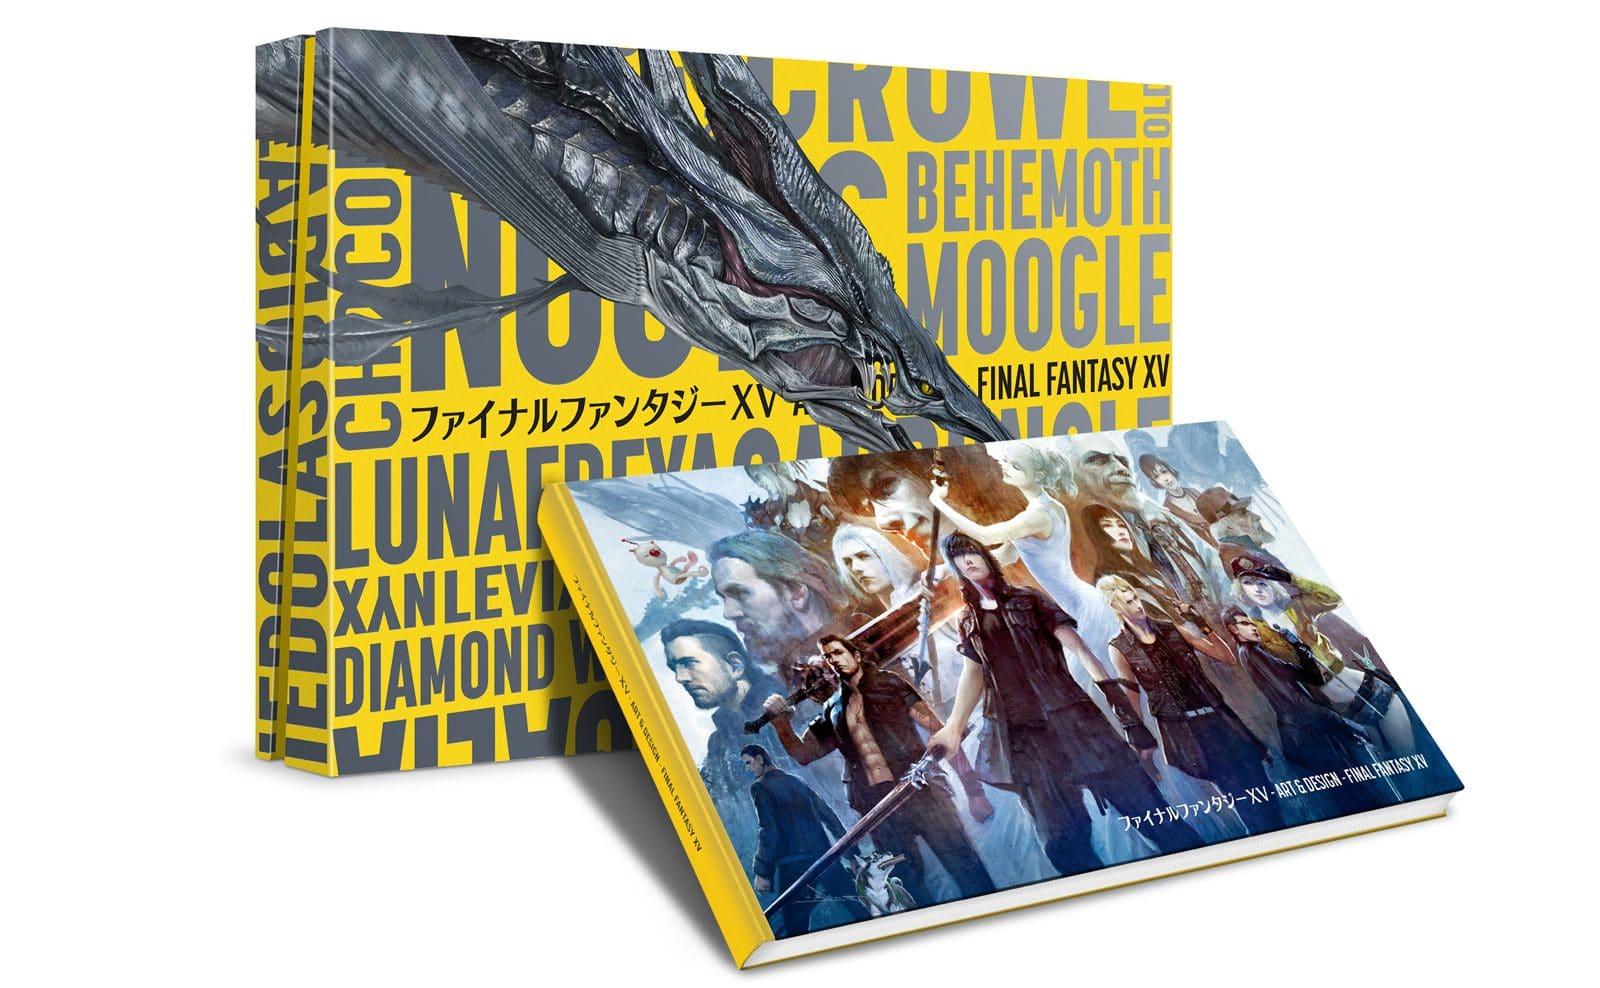 The Art & Design of Final Fantasy XV